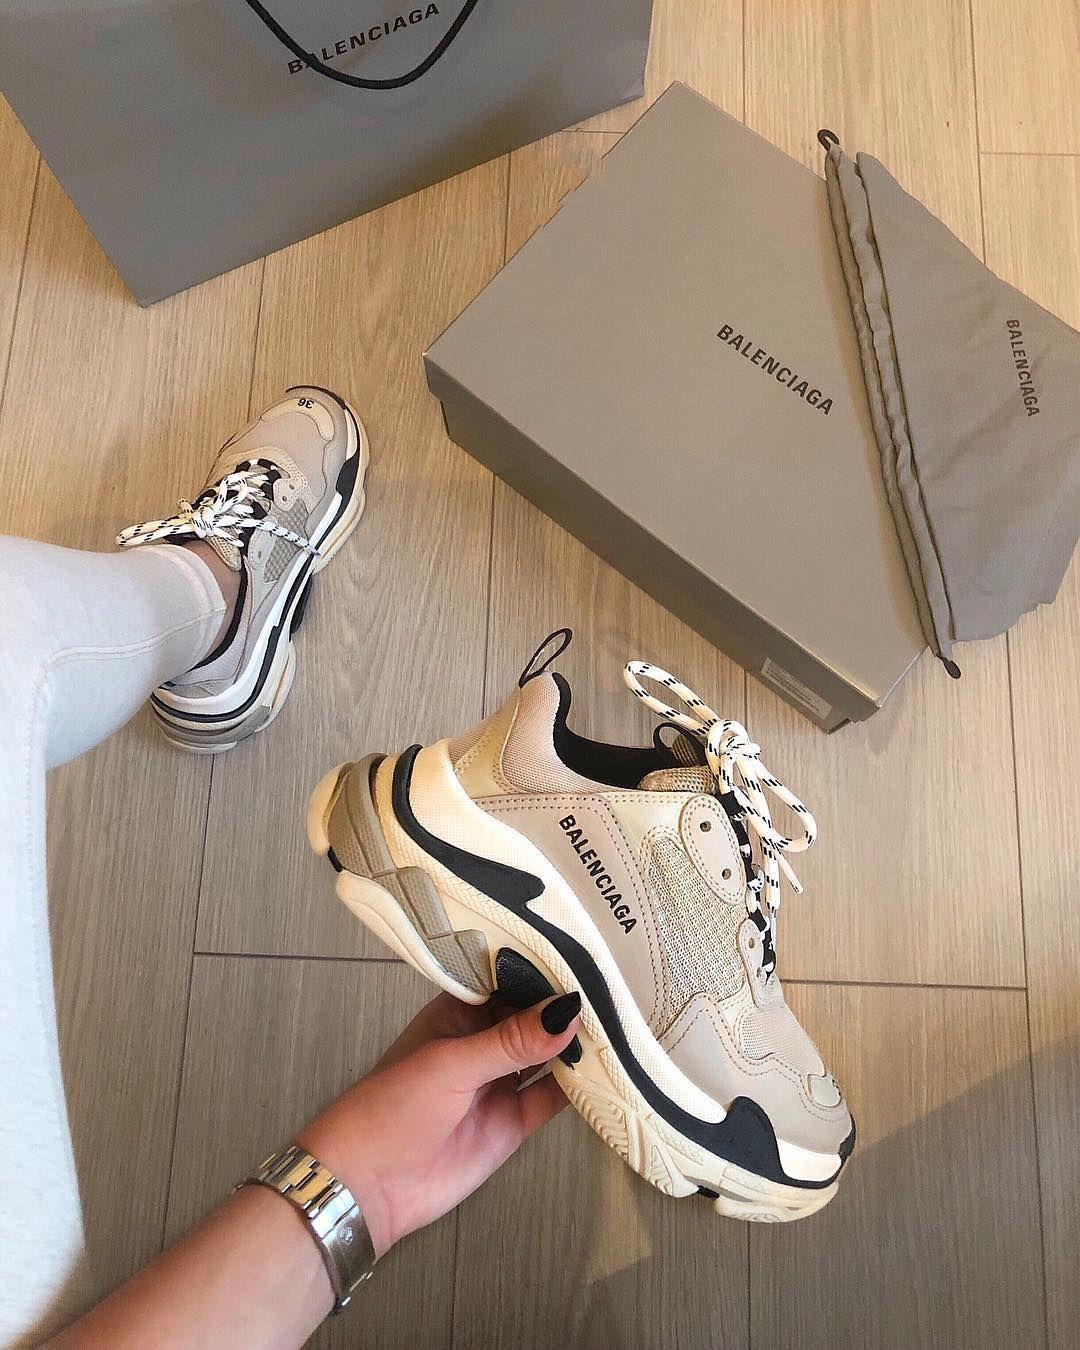 "SneakCorner on Instagram: ""Balenciaga Triple S"